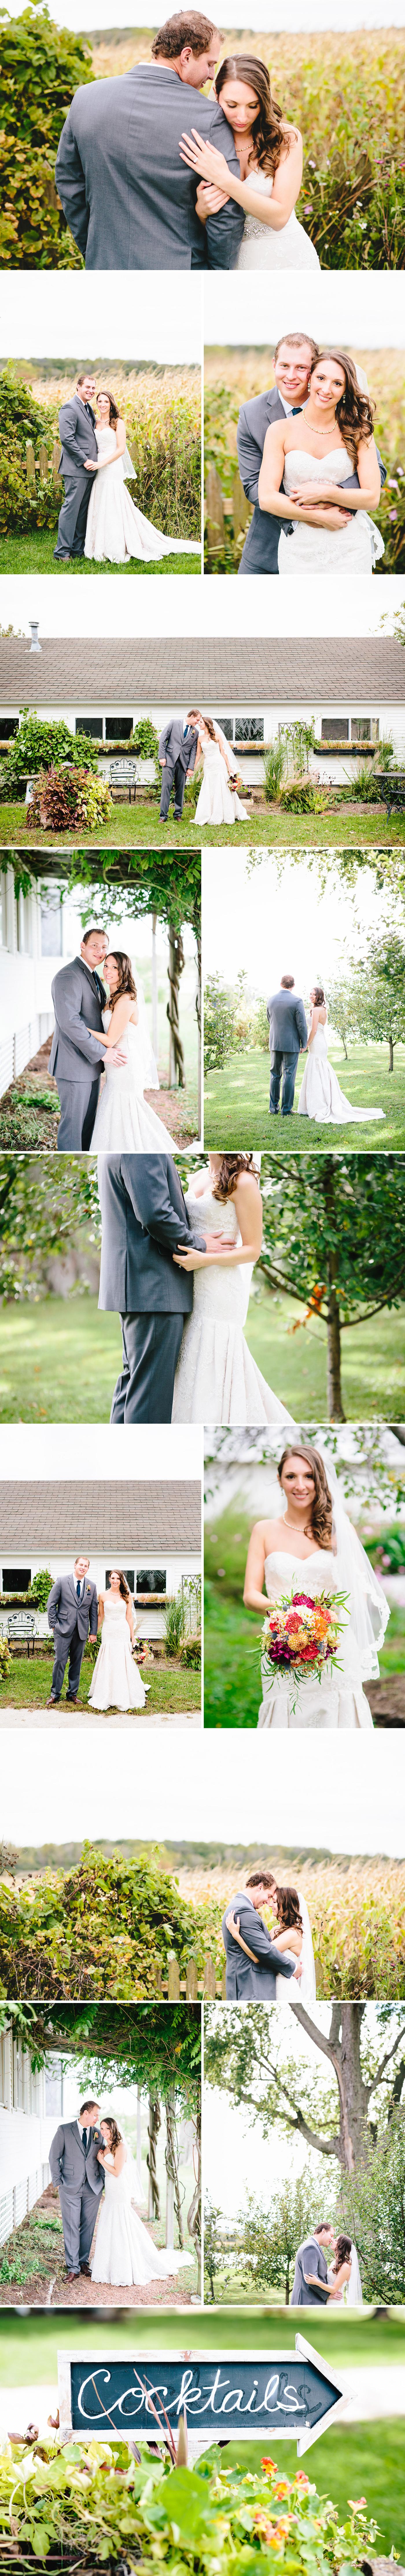 chicago-fine-art-wedding-photography-aloisio6